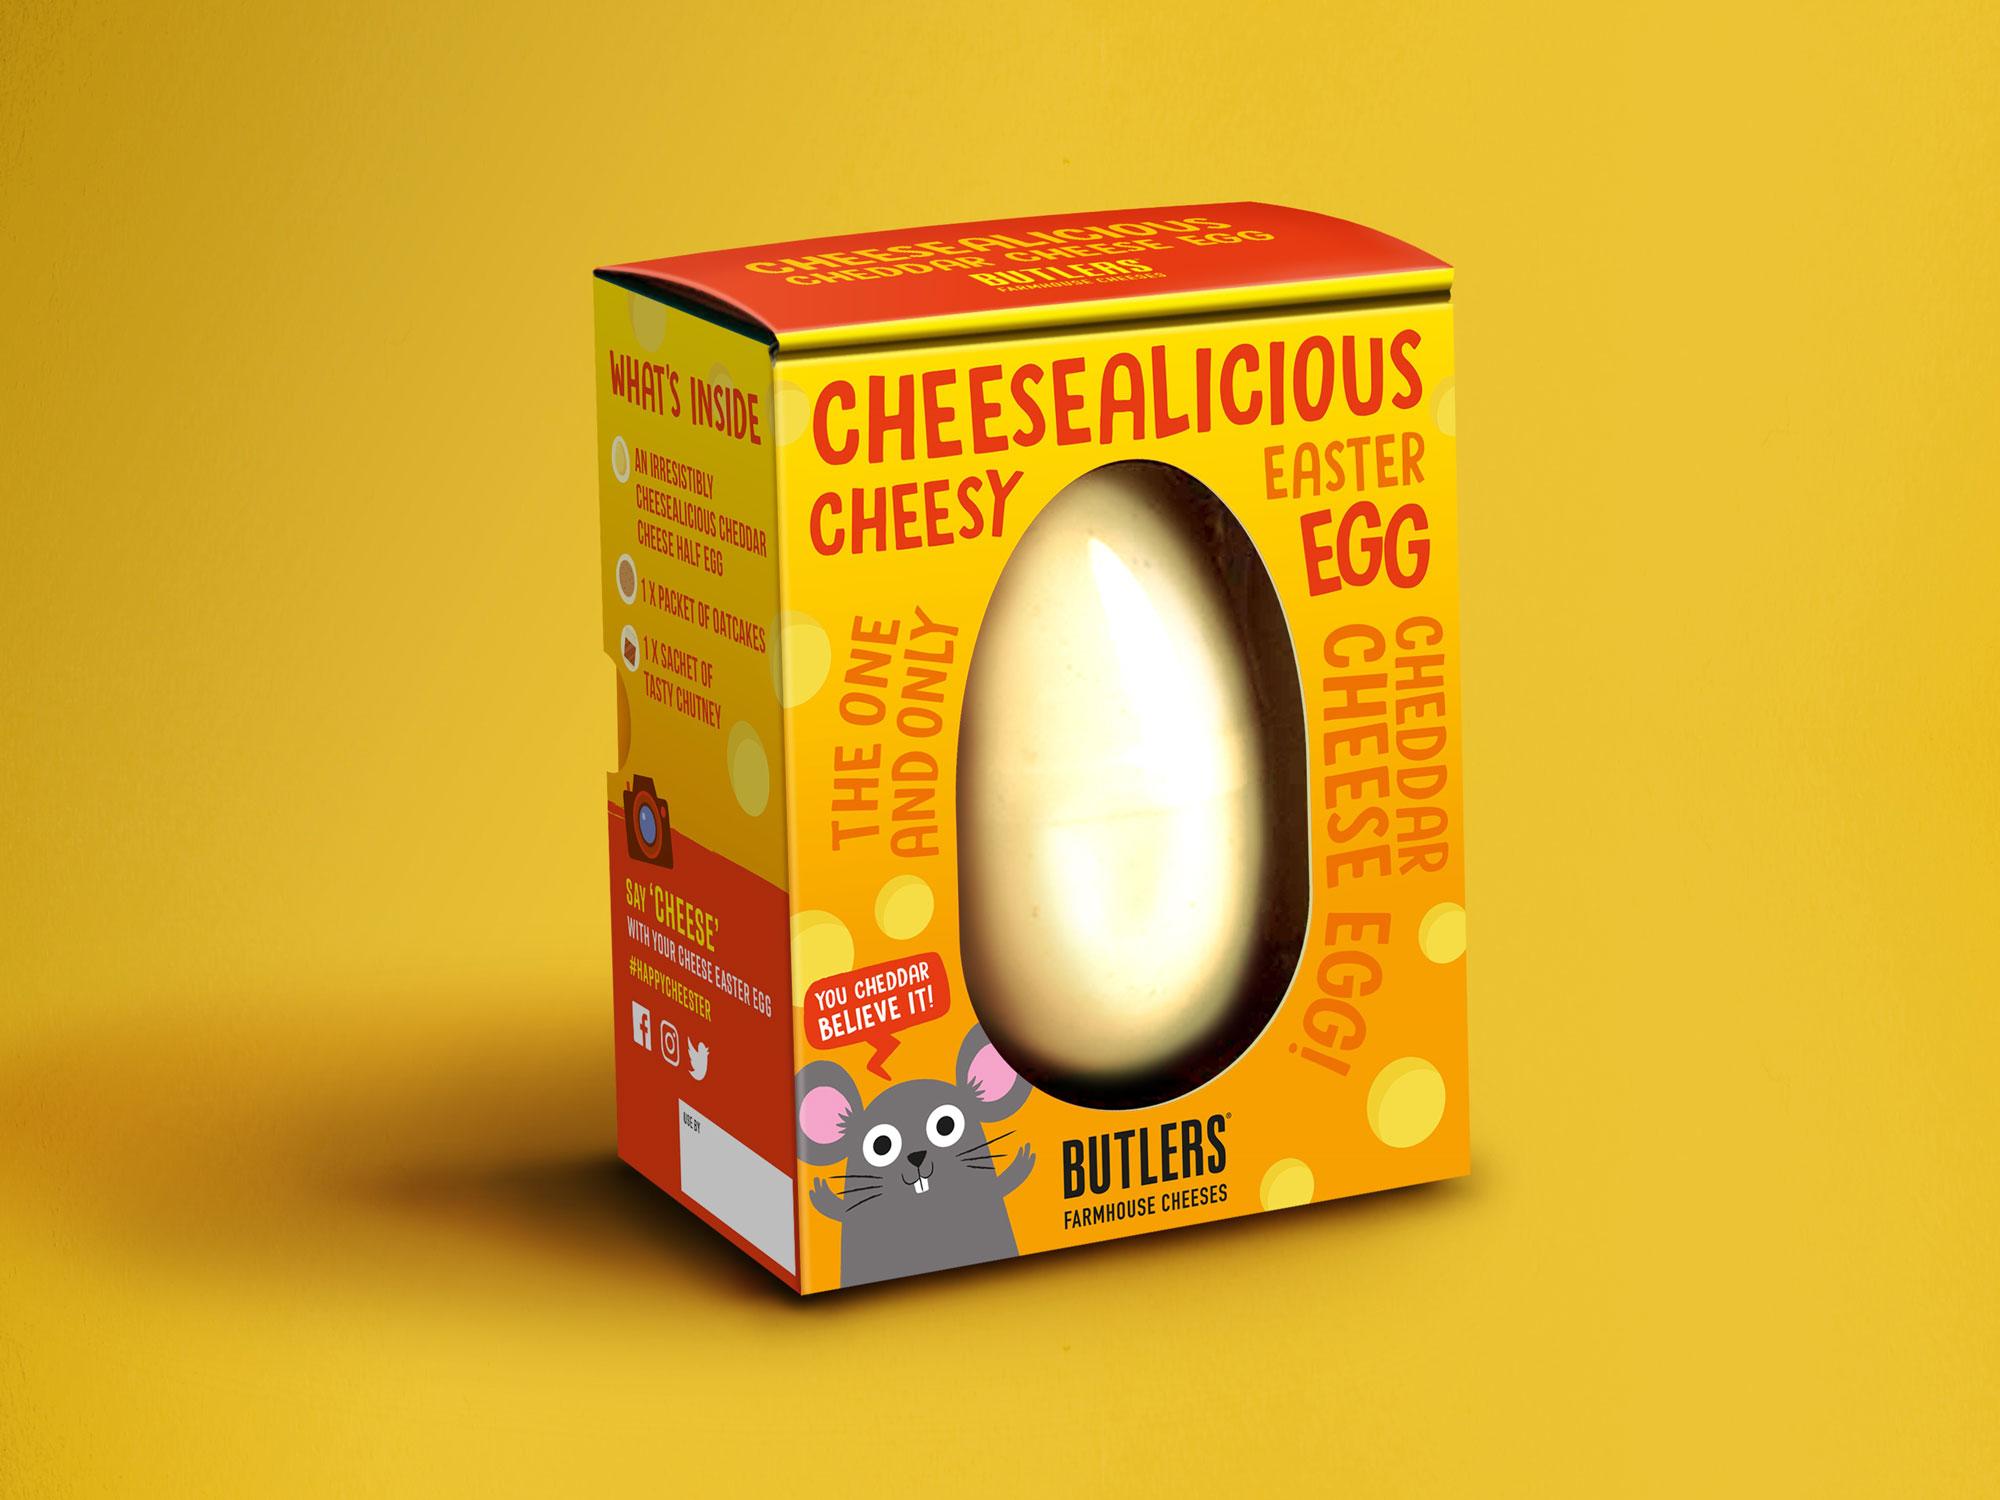 Sainsbury's Cheese Easter Egg